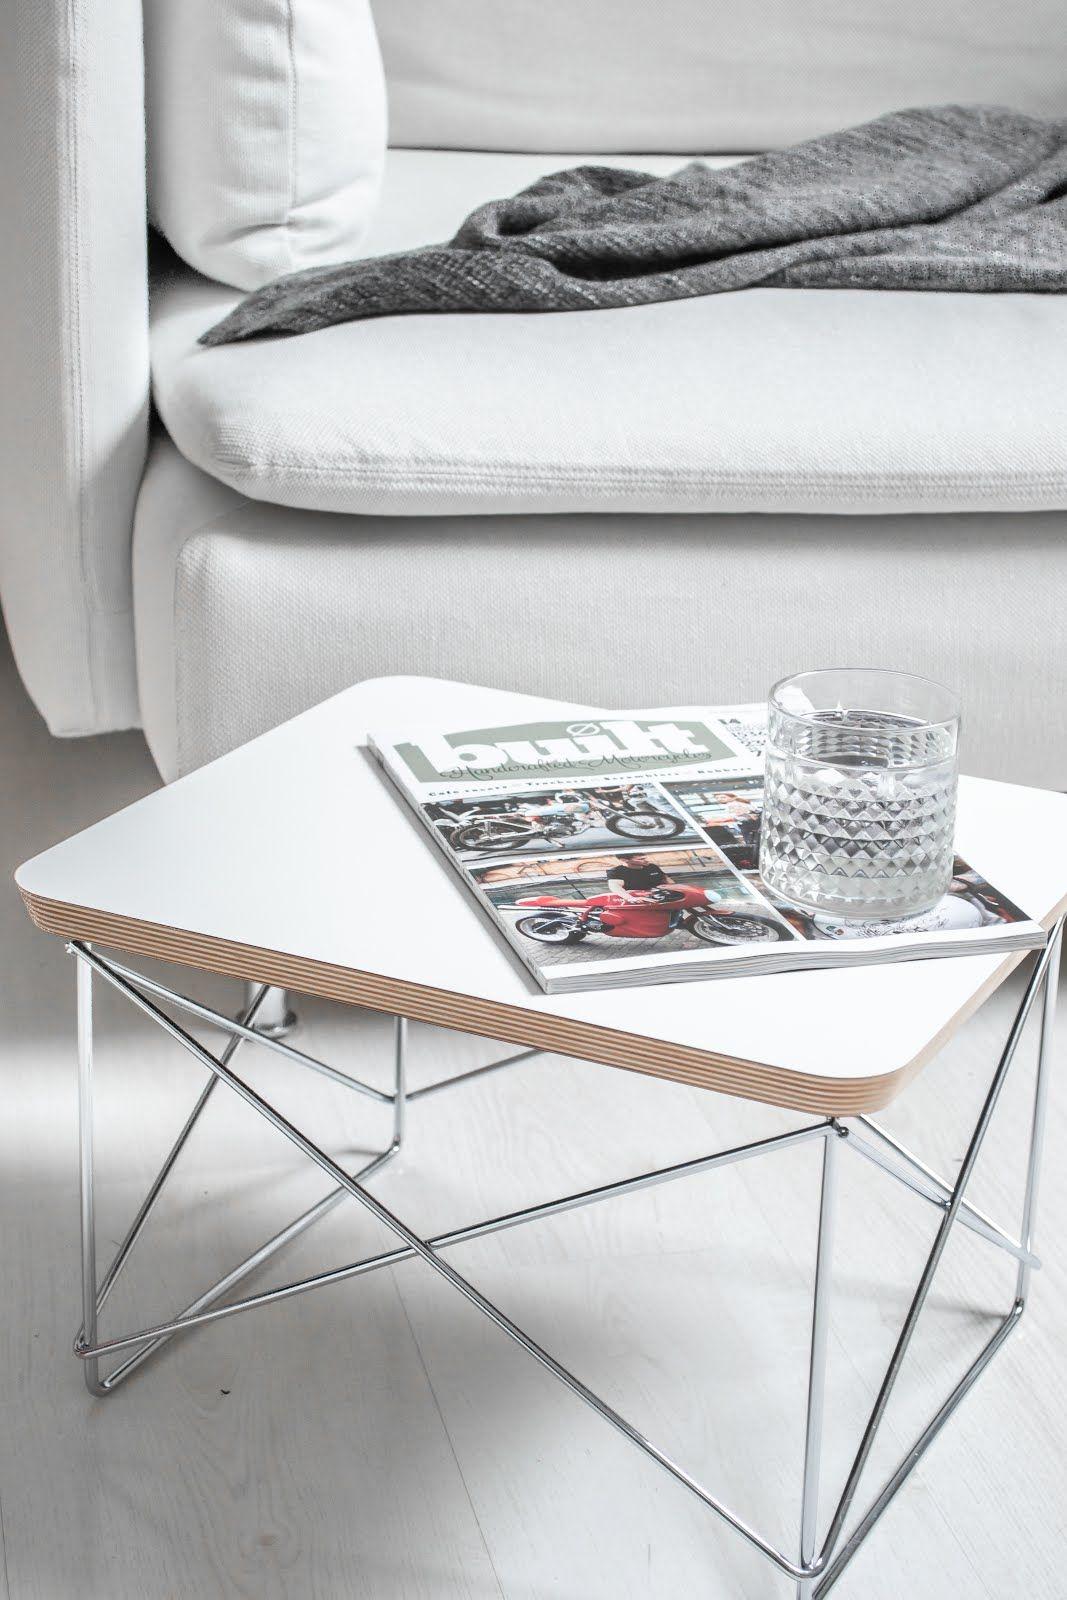 Vitra Ltr Table Charles Ray Eames Flinders Interior Design Minimal Interior Salon Tafel Side Table Occasional Table Woonkamertafels Interieur Salontafel [ 1600 x 1067 Pixel ]